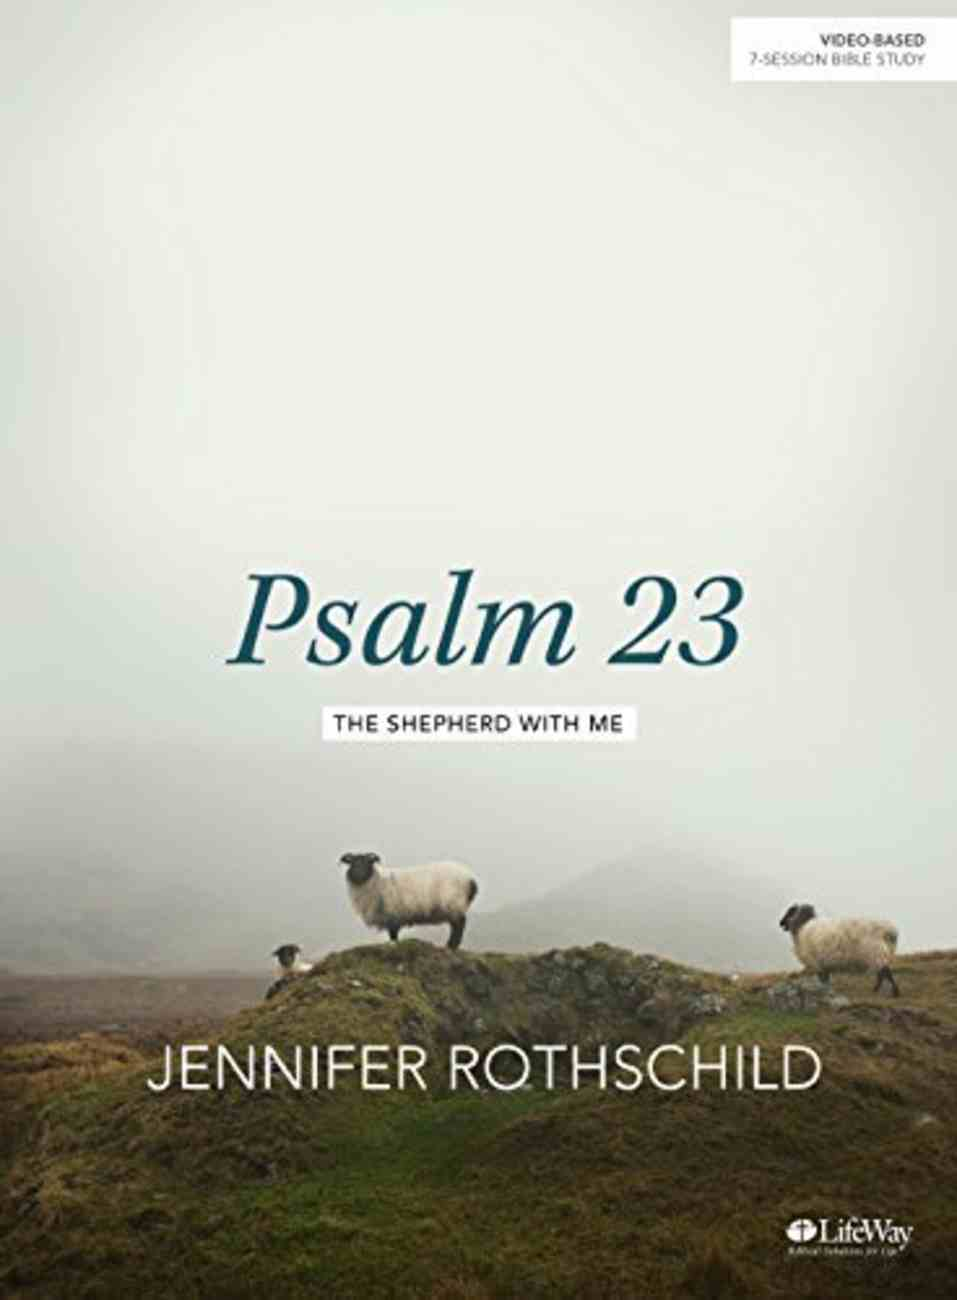 Psalm 23 (2 Dvds) (Dvd Only Set) DVD